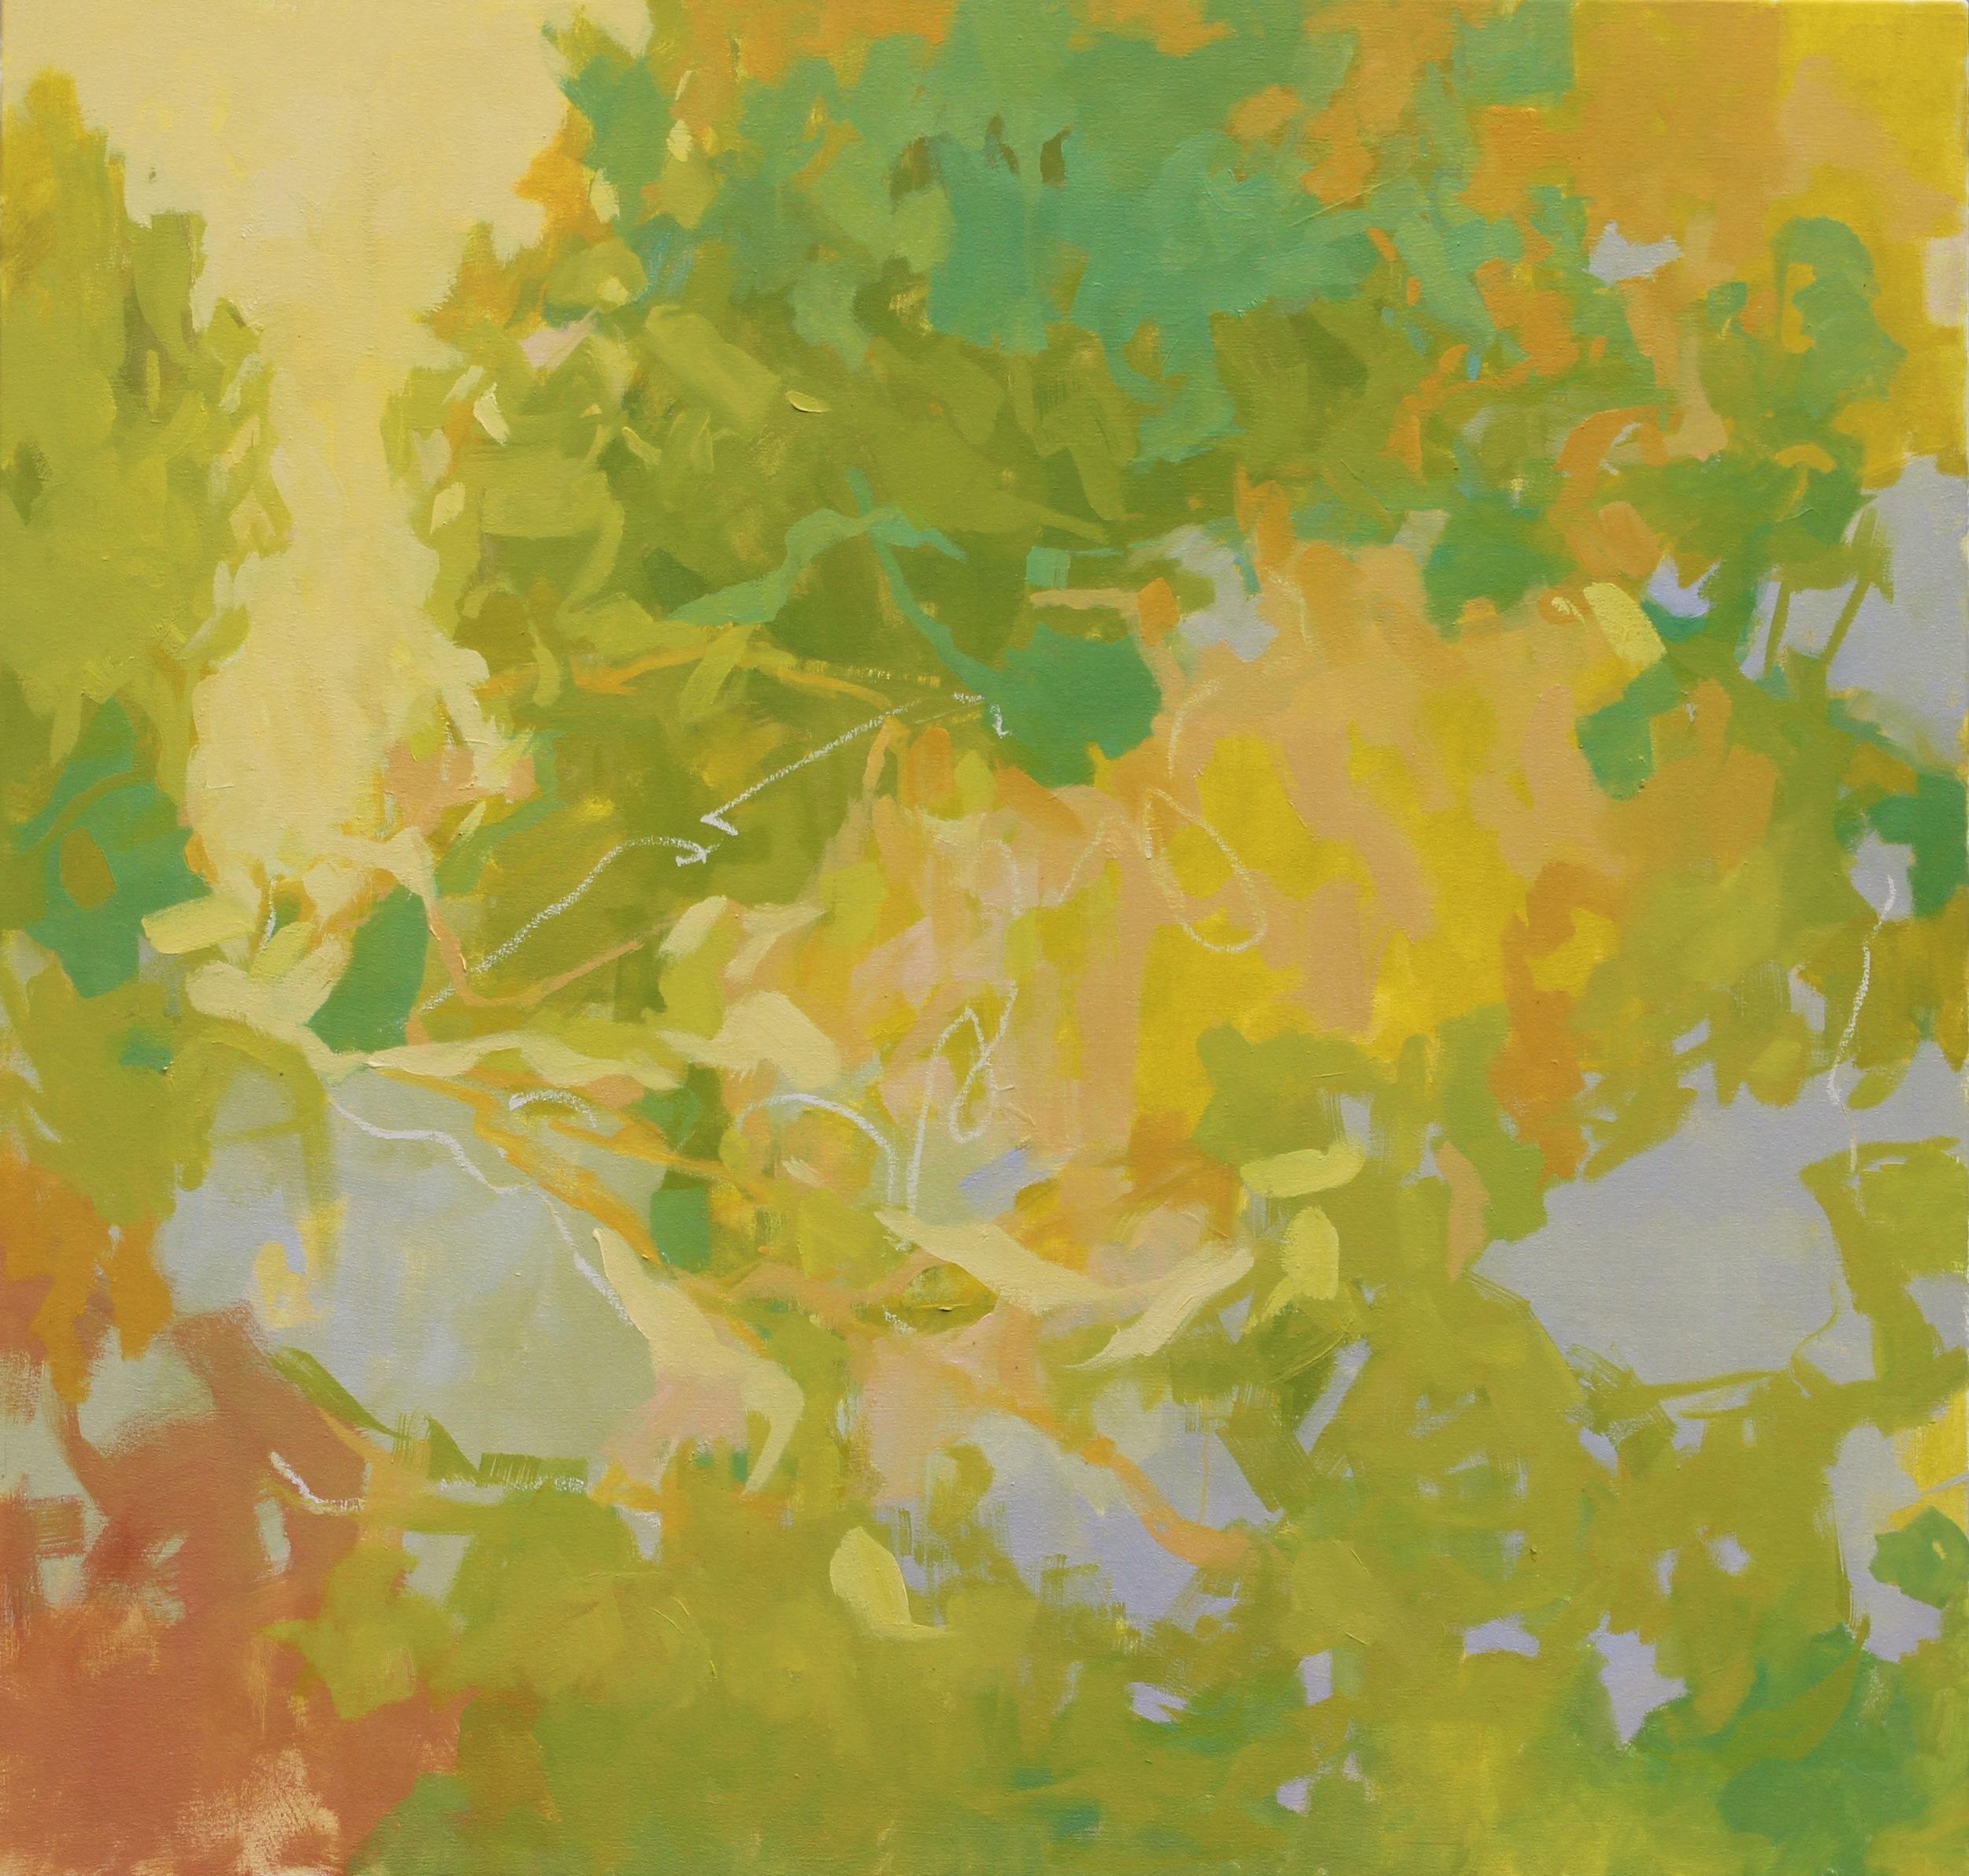 Schmitz_Spring's Arrival_oil on canvas_44x46_3400.jpg